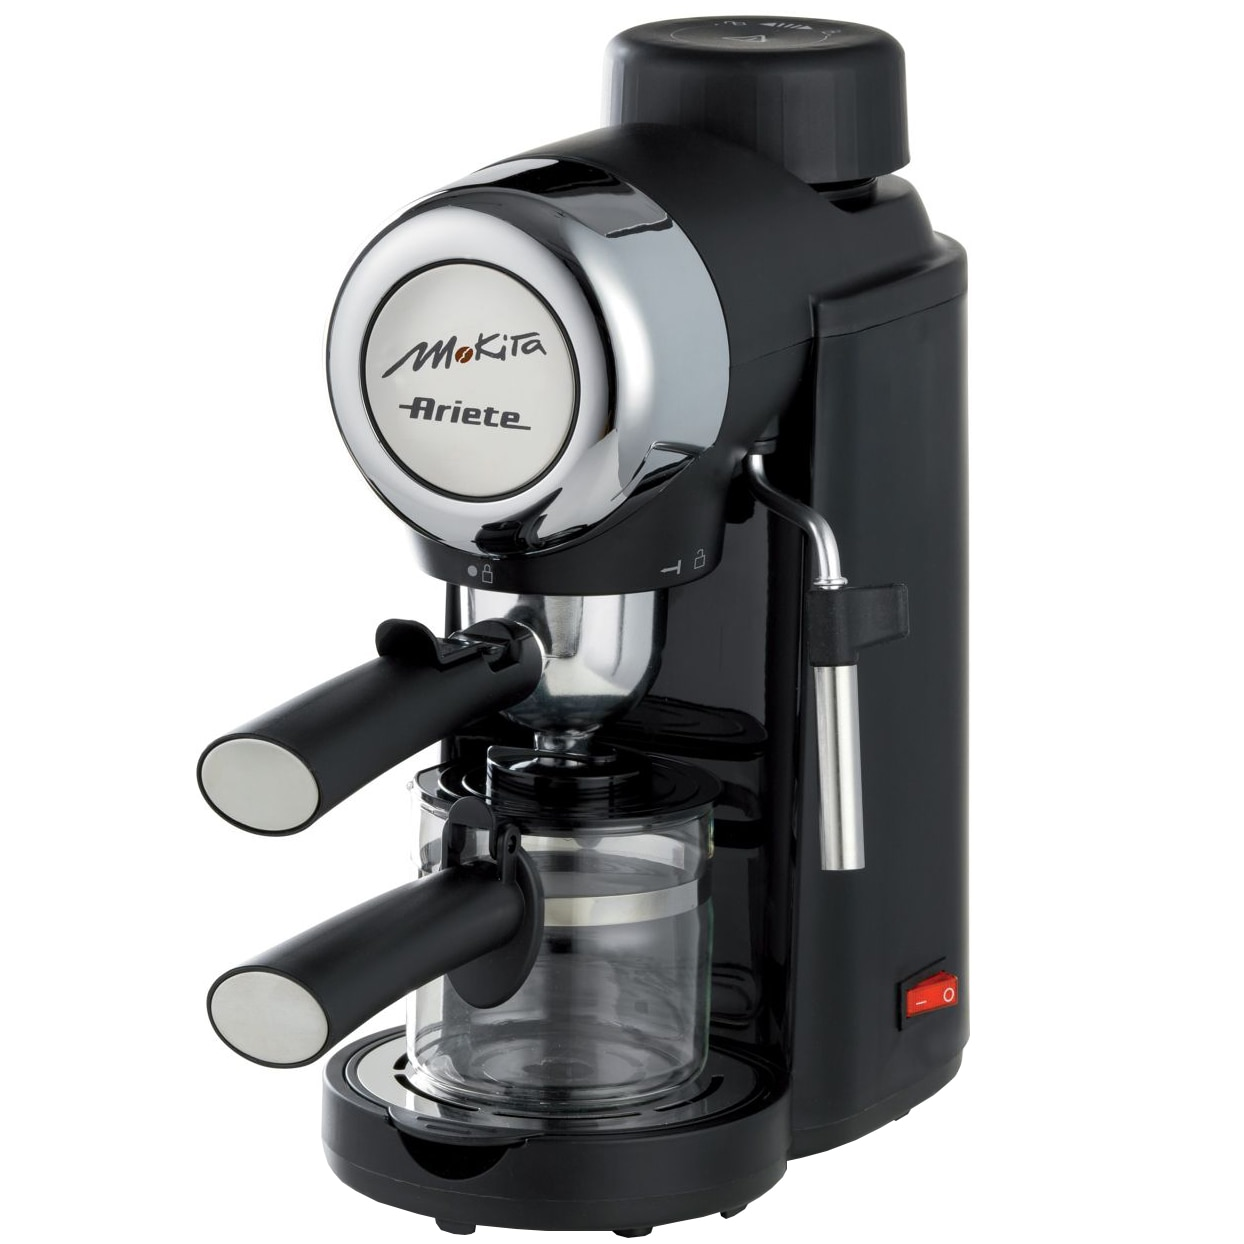 Fotografie Espressor Ariete Mokita 1340, 5 bar, 800W, 4 cesti, Negru